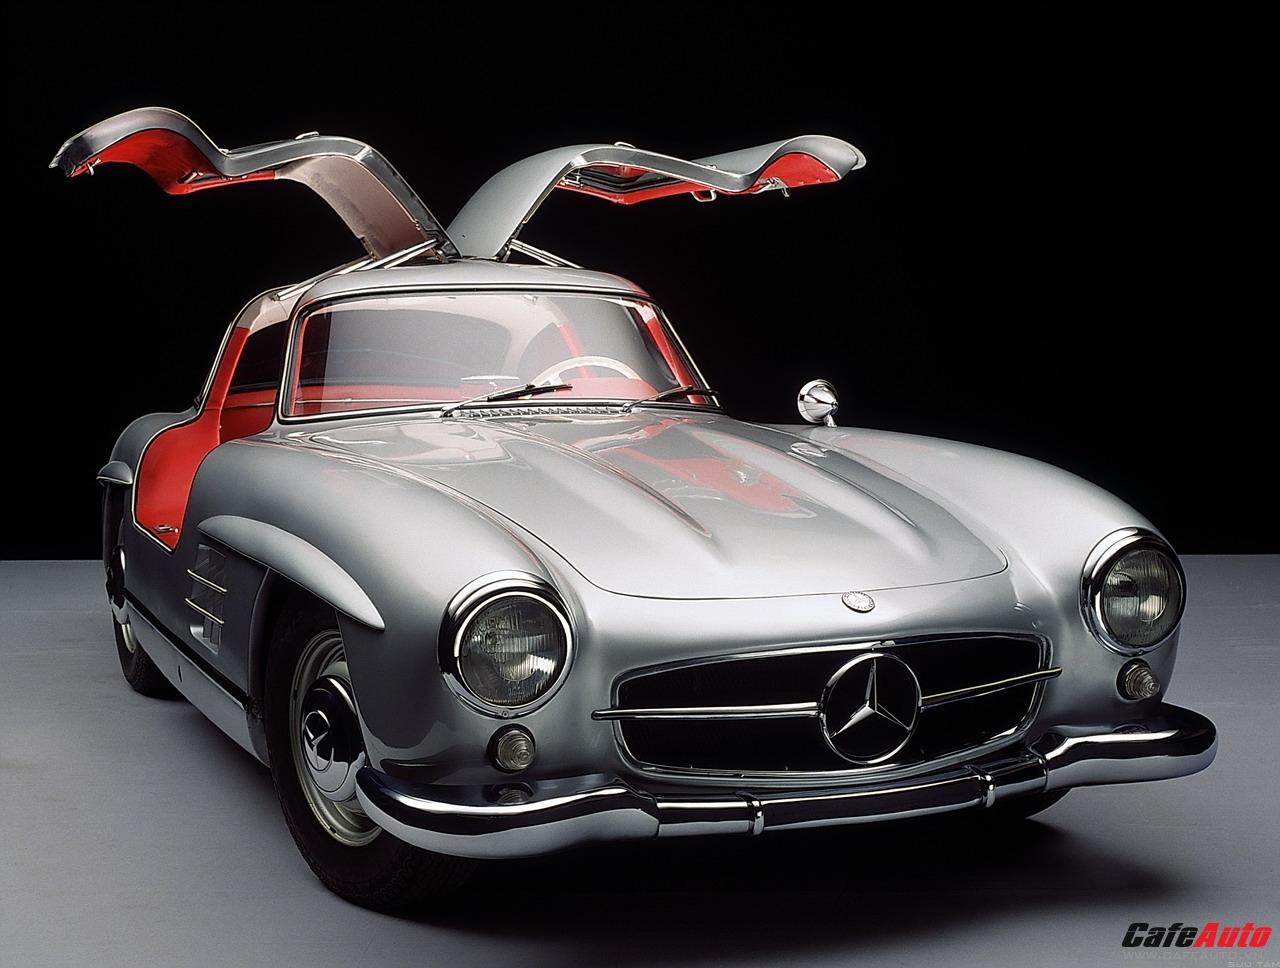 1954 Mercedes-Benz 300 SL, W 198